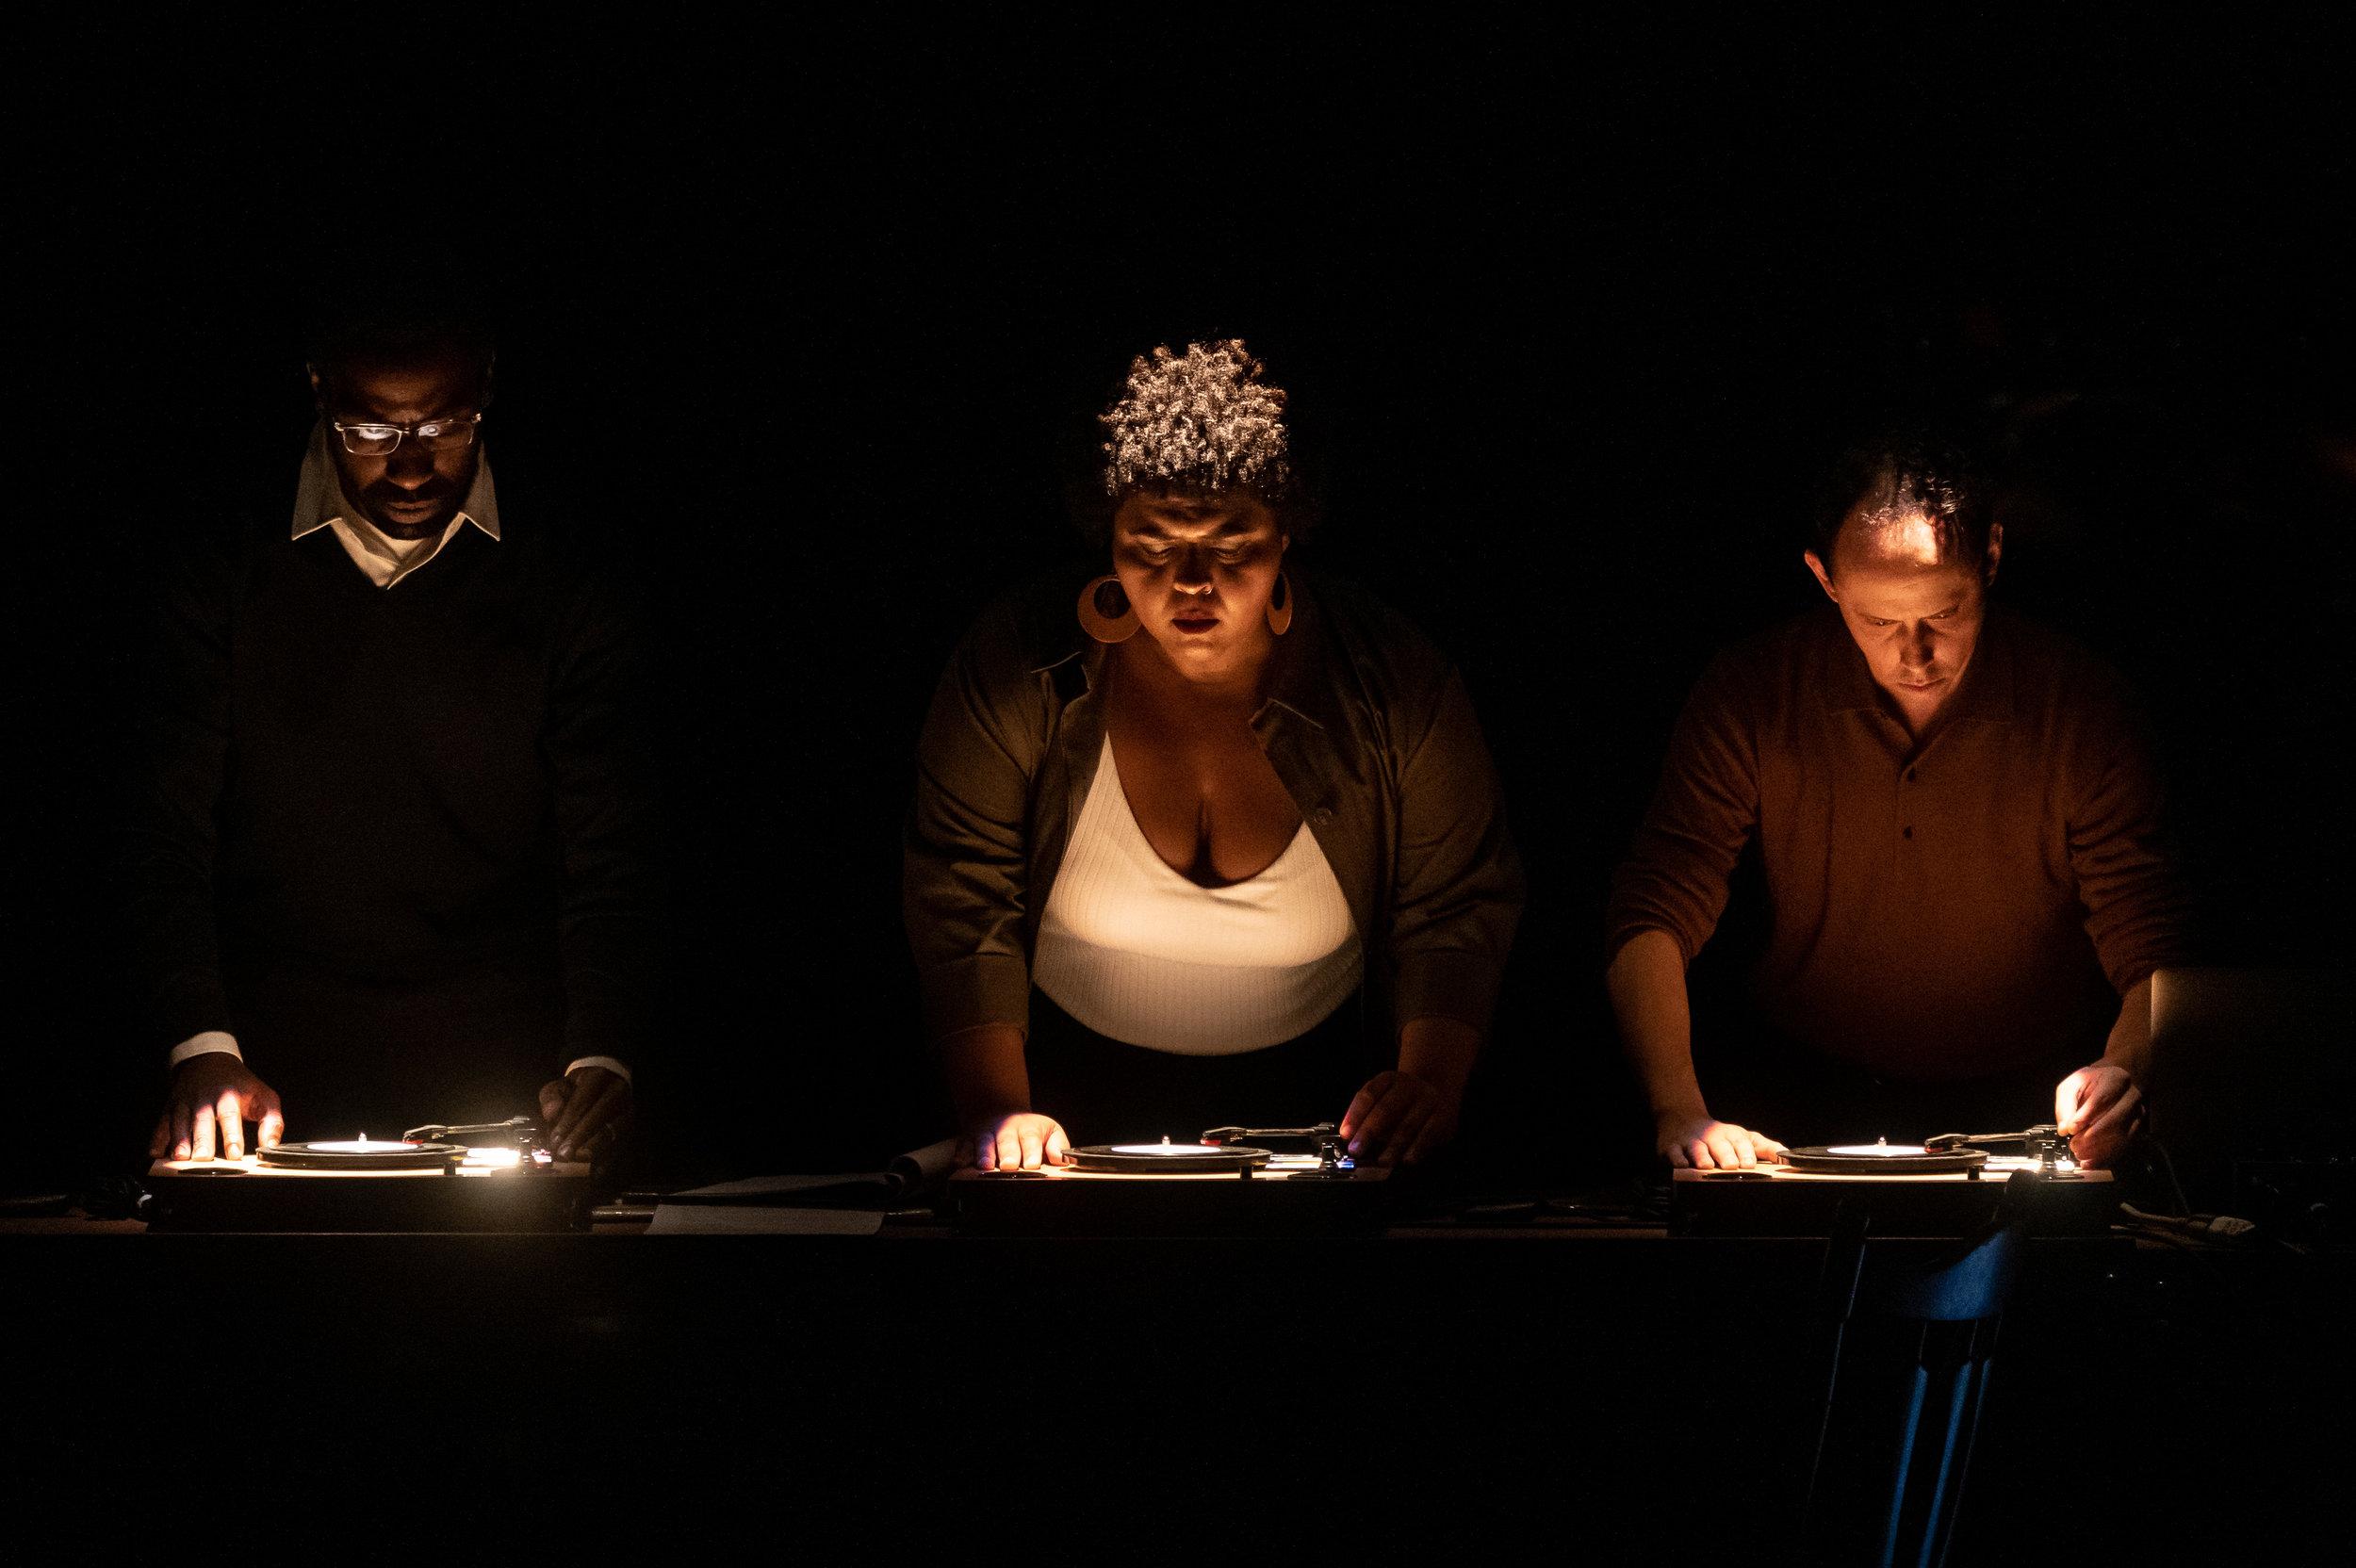 _jazz singer_featuring Nehemiah Luckett, Cristina Pitter and Joshua William Gelb_CREDIT IAN DOUGLAS.jpg